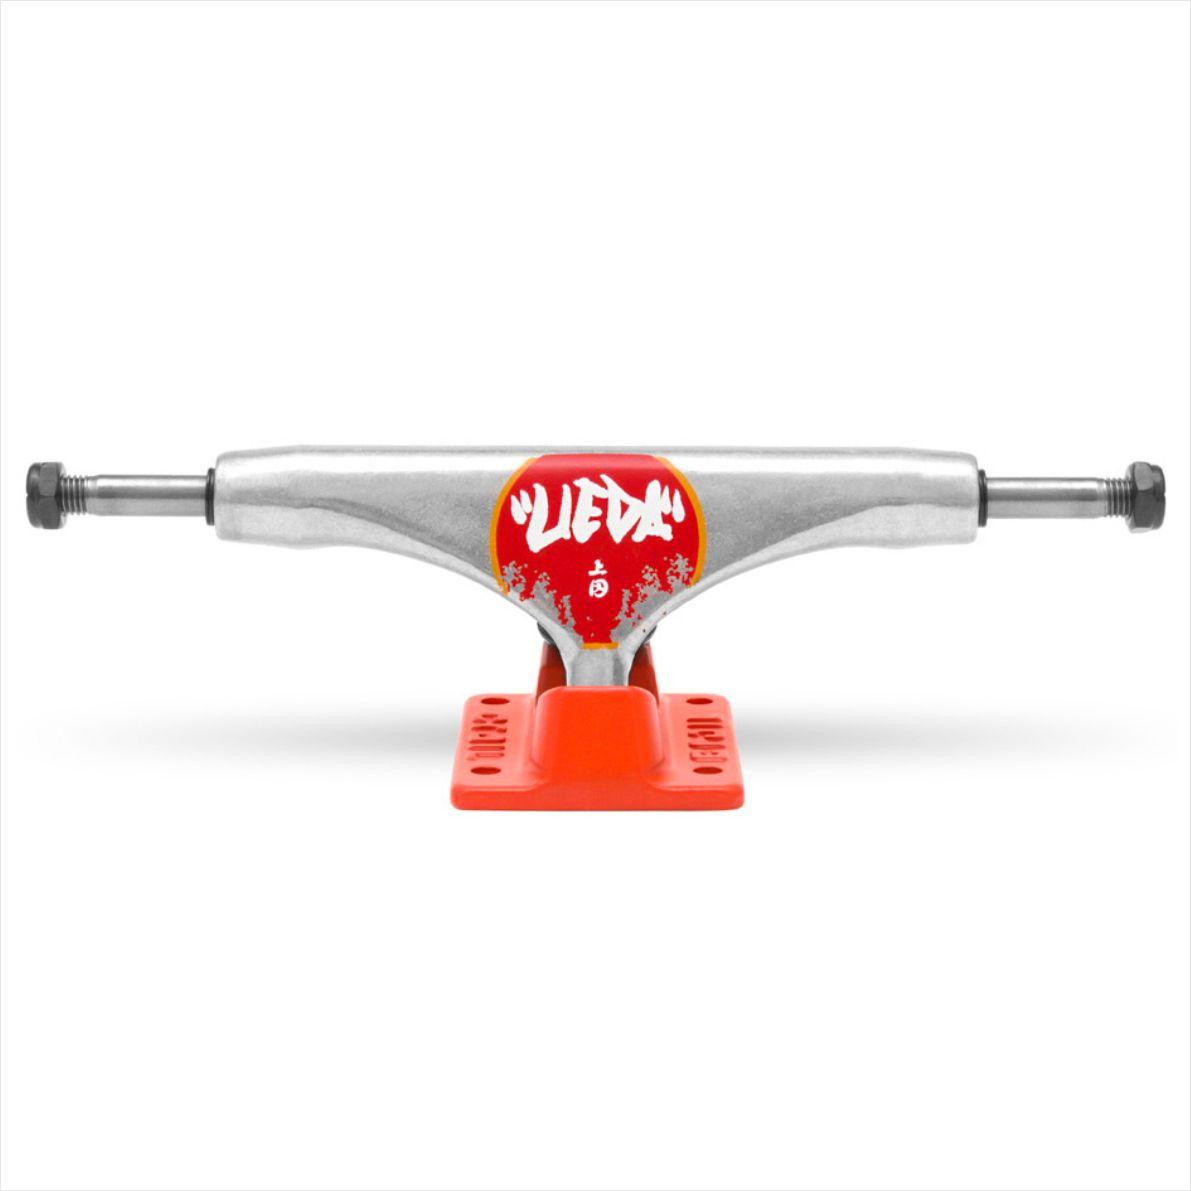 Truck Crail Mid 142 Tipografia Ueda  - No Comply Skate Shop